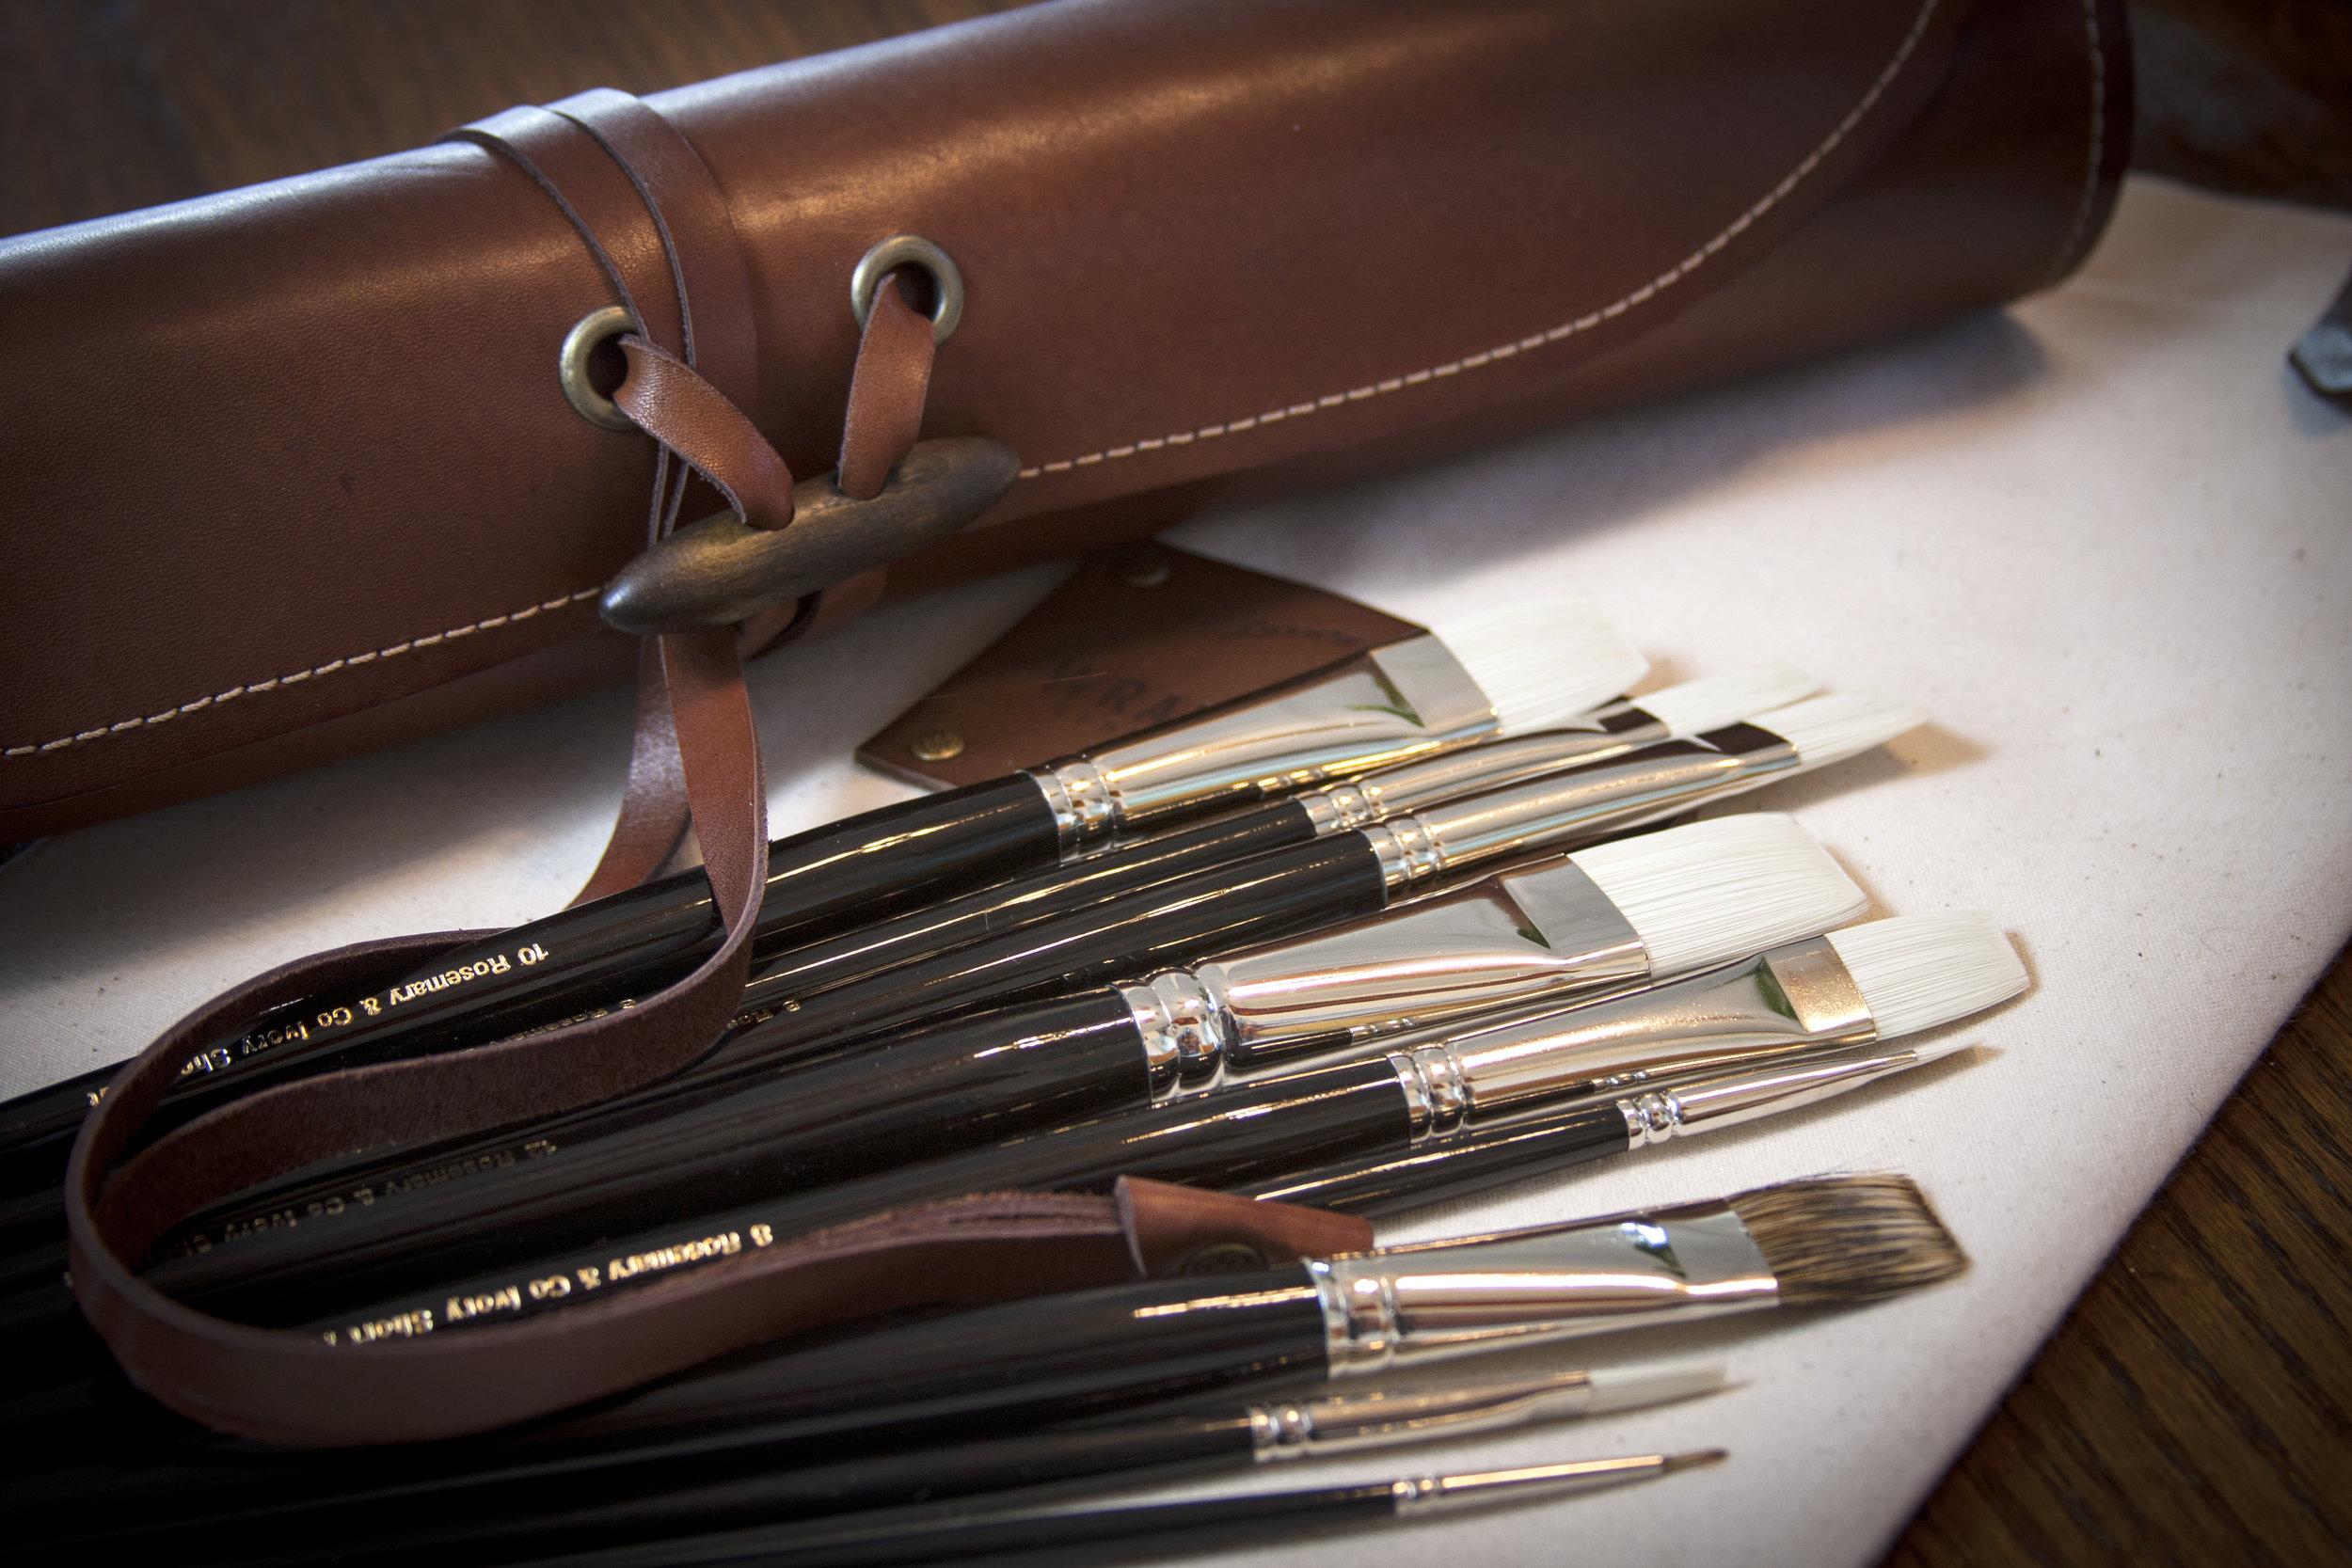 Rosemary & Co brushes and Leather Brush Wrap